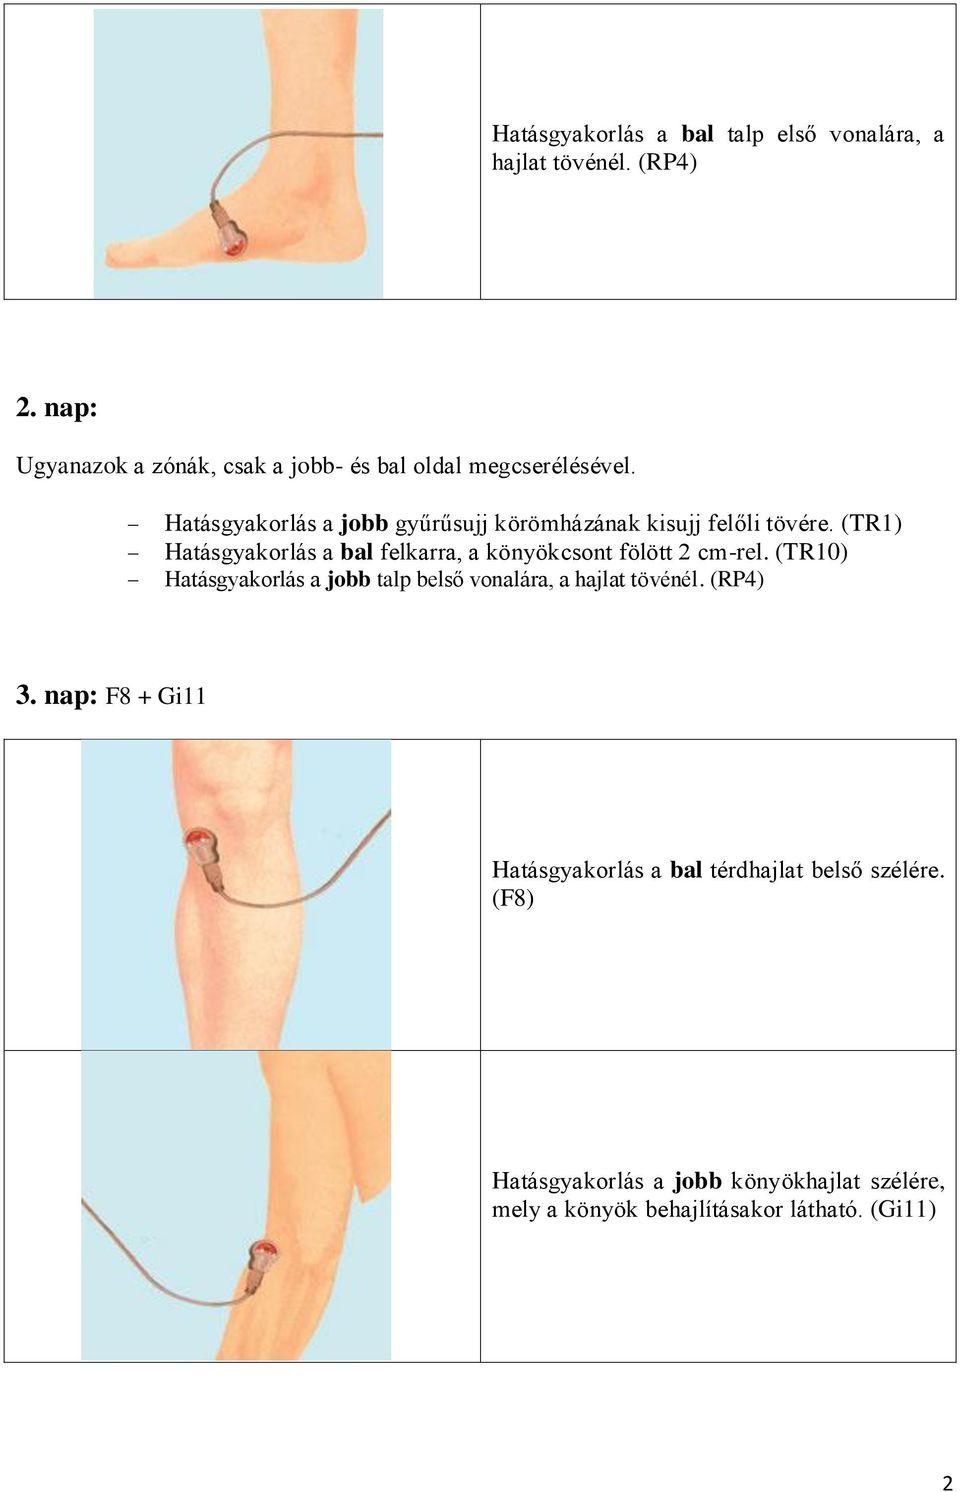 dexamethasone ízületi fájdalom